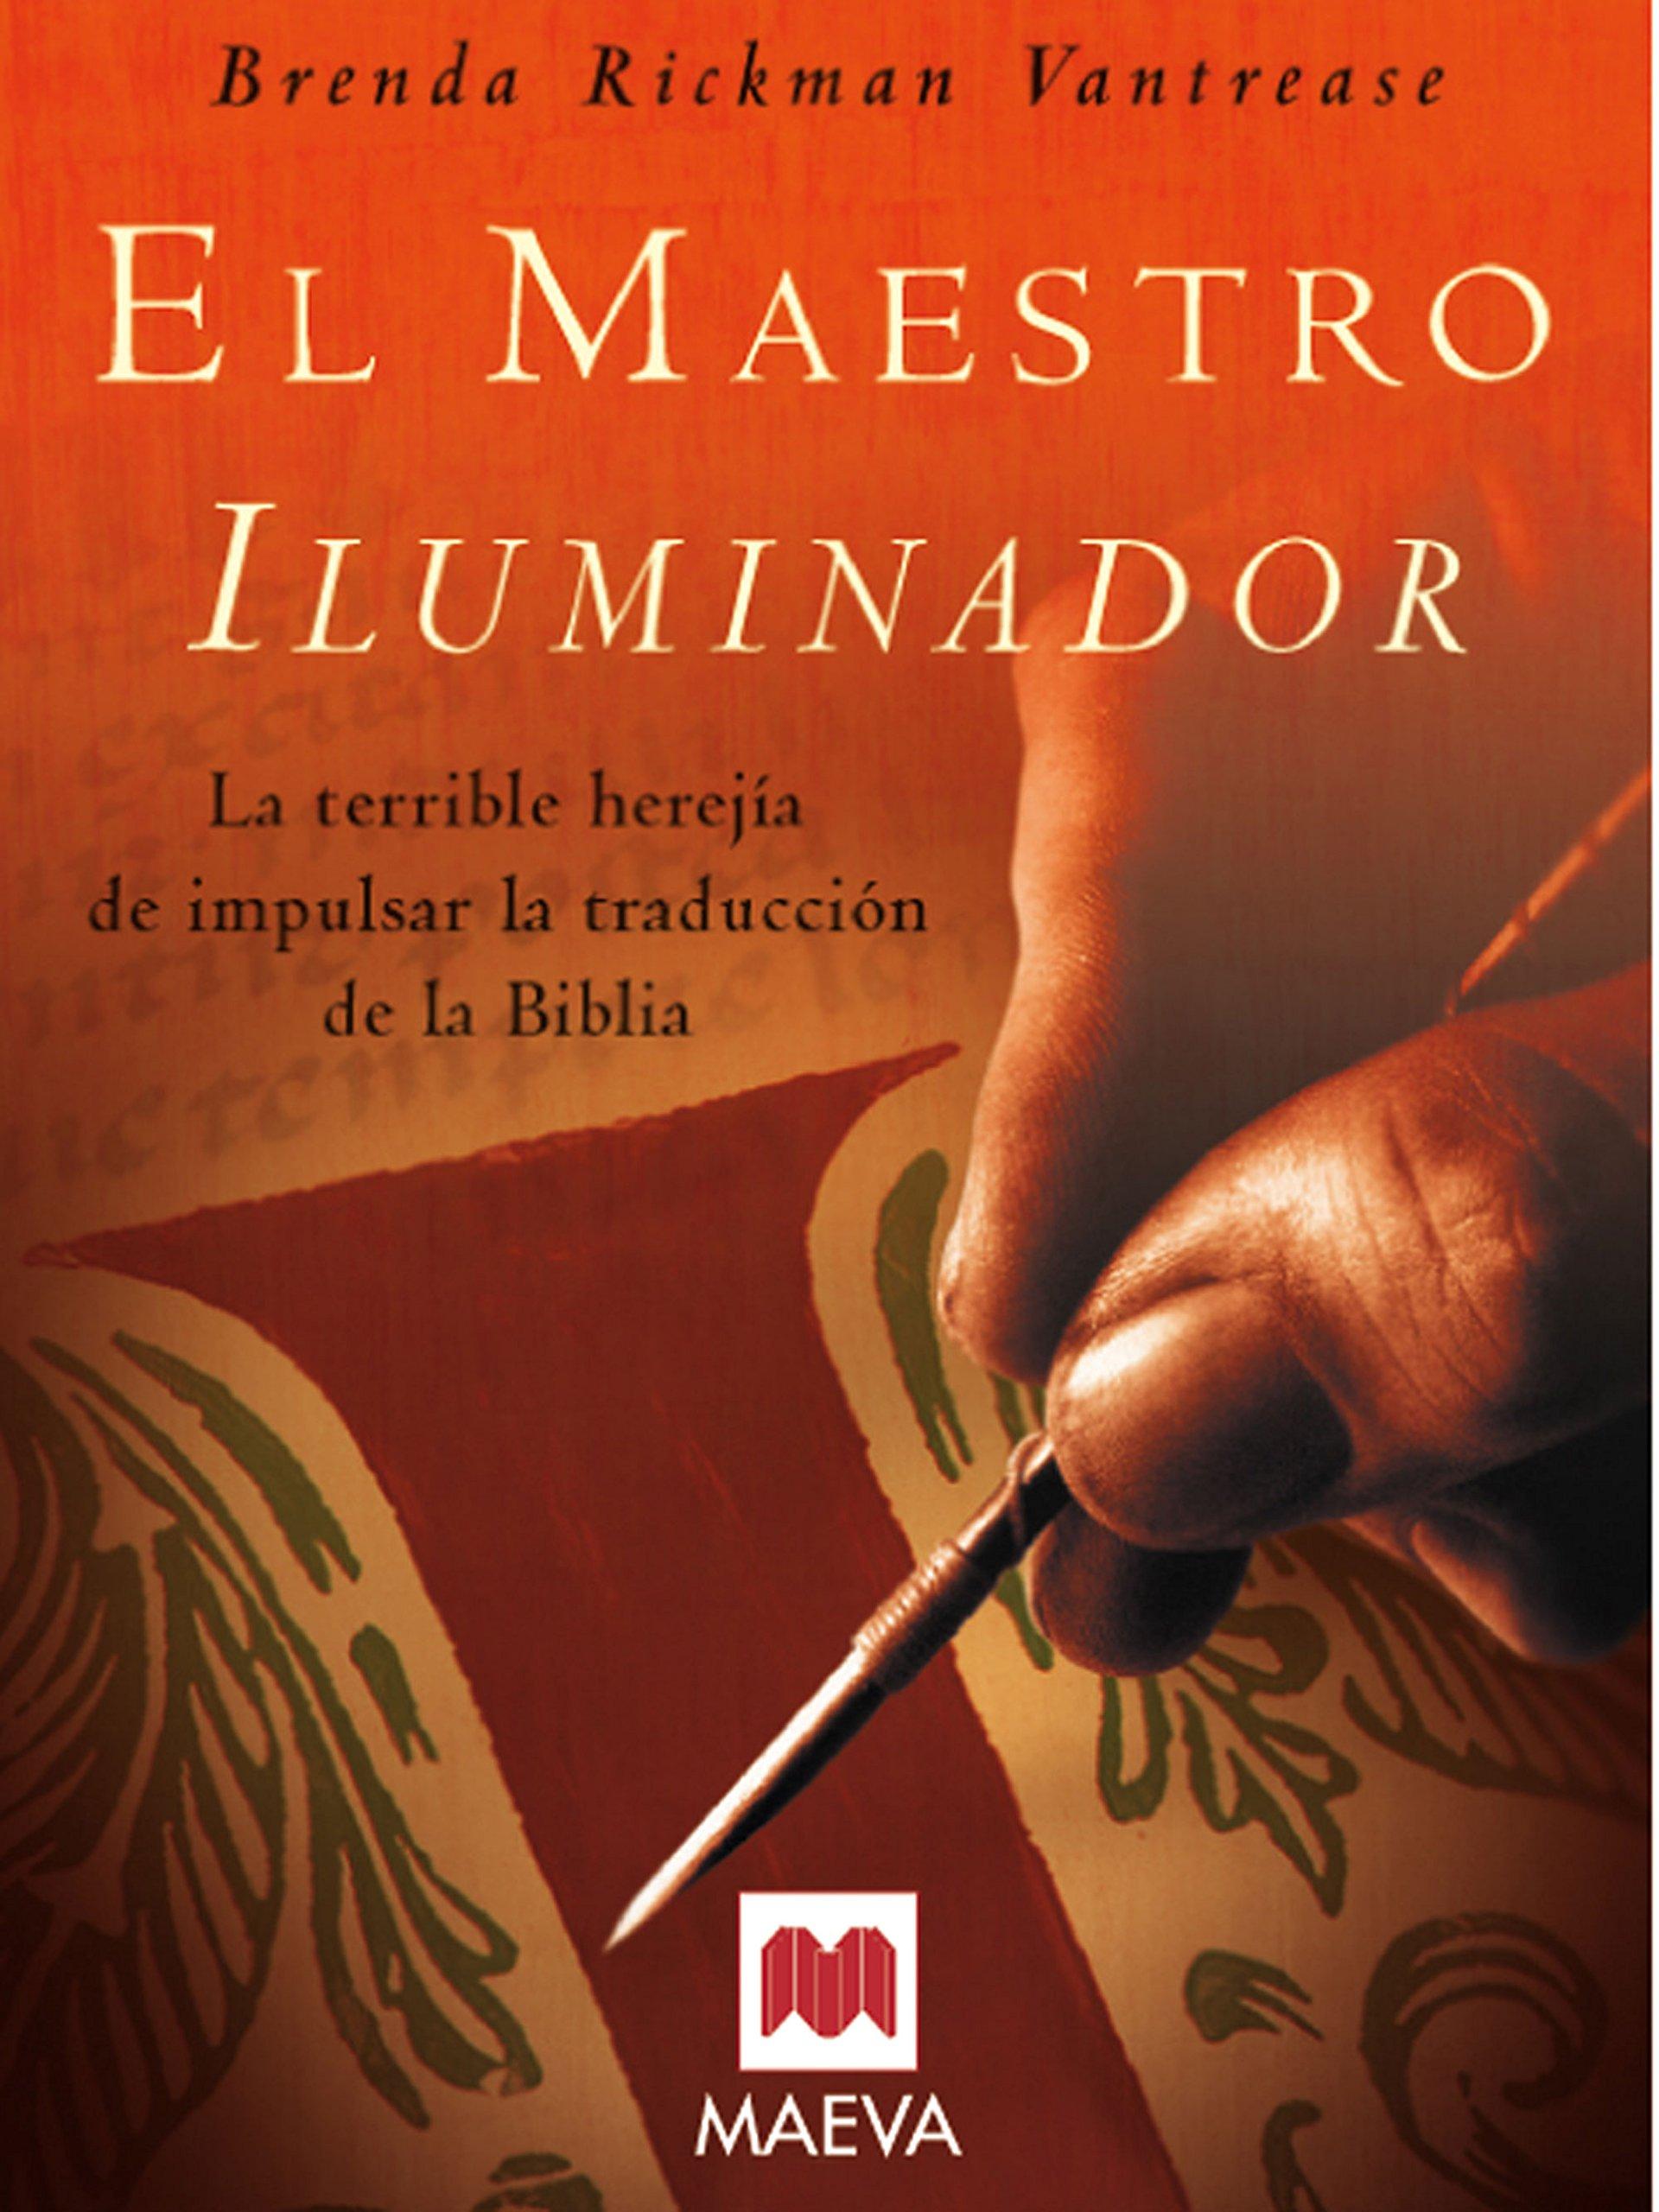 El Maestro Iluminador/the Illuminating Teacher (Nueva Historia) (Spanish  Edition): Brenda Rickman Vantrease: 9788496231405: Amazon.com: Books